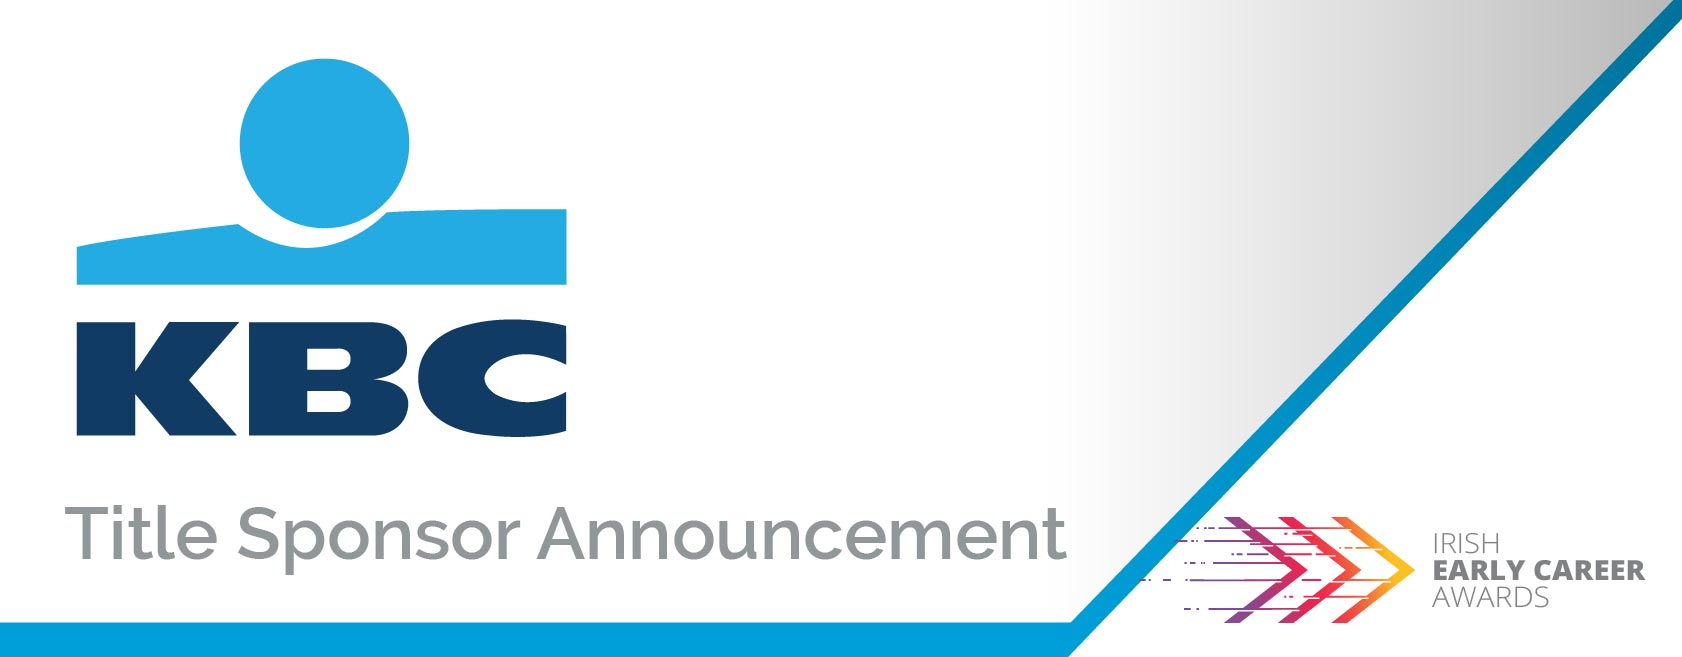 KBC Bank Title Sponsor Irish Early Career Awards